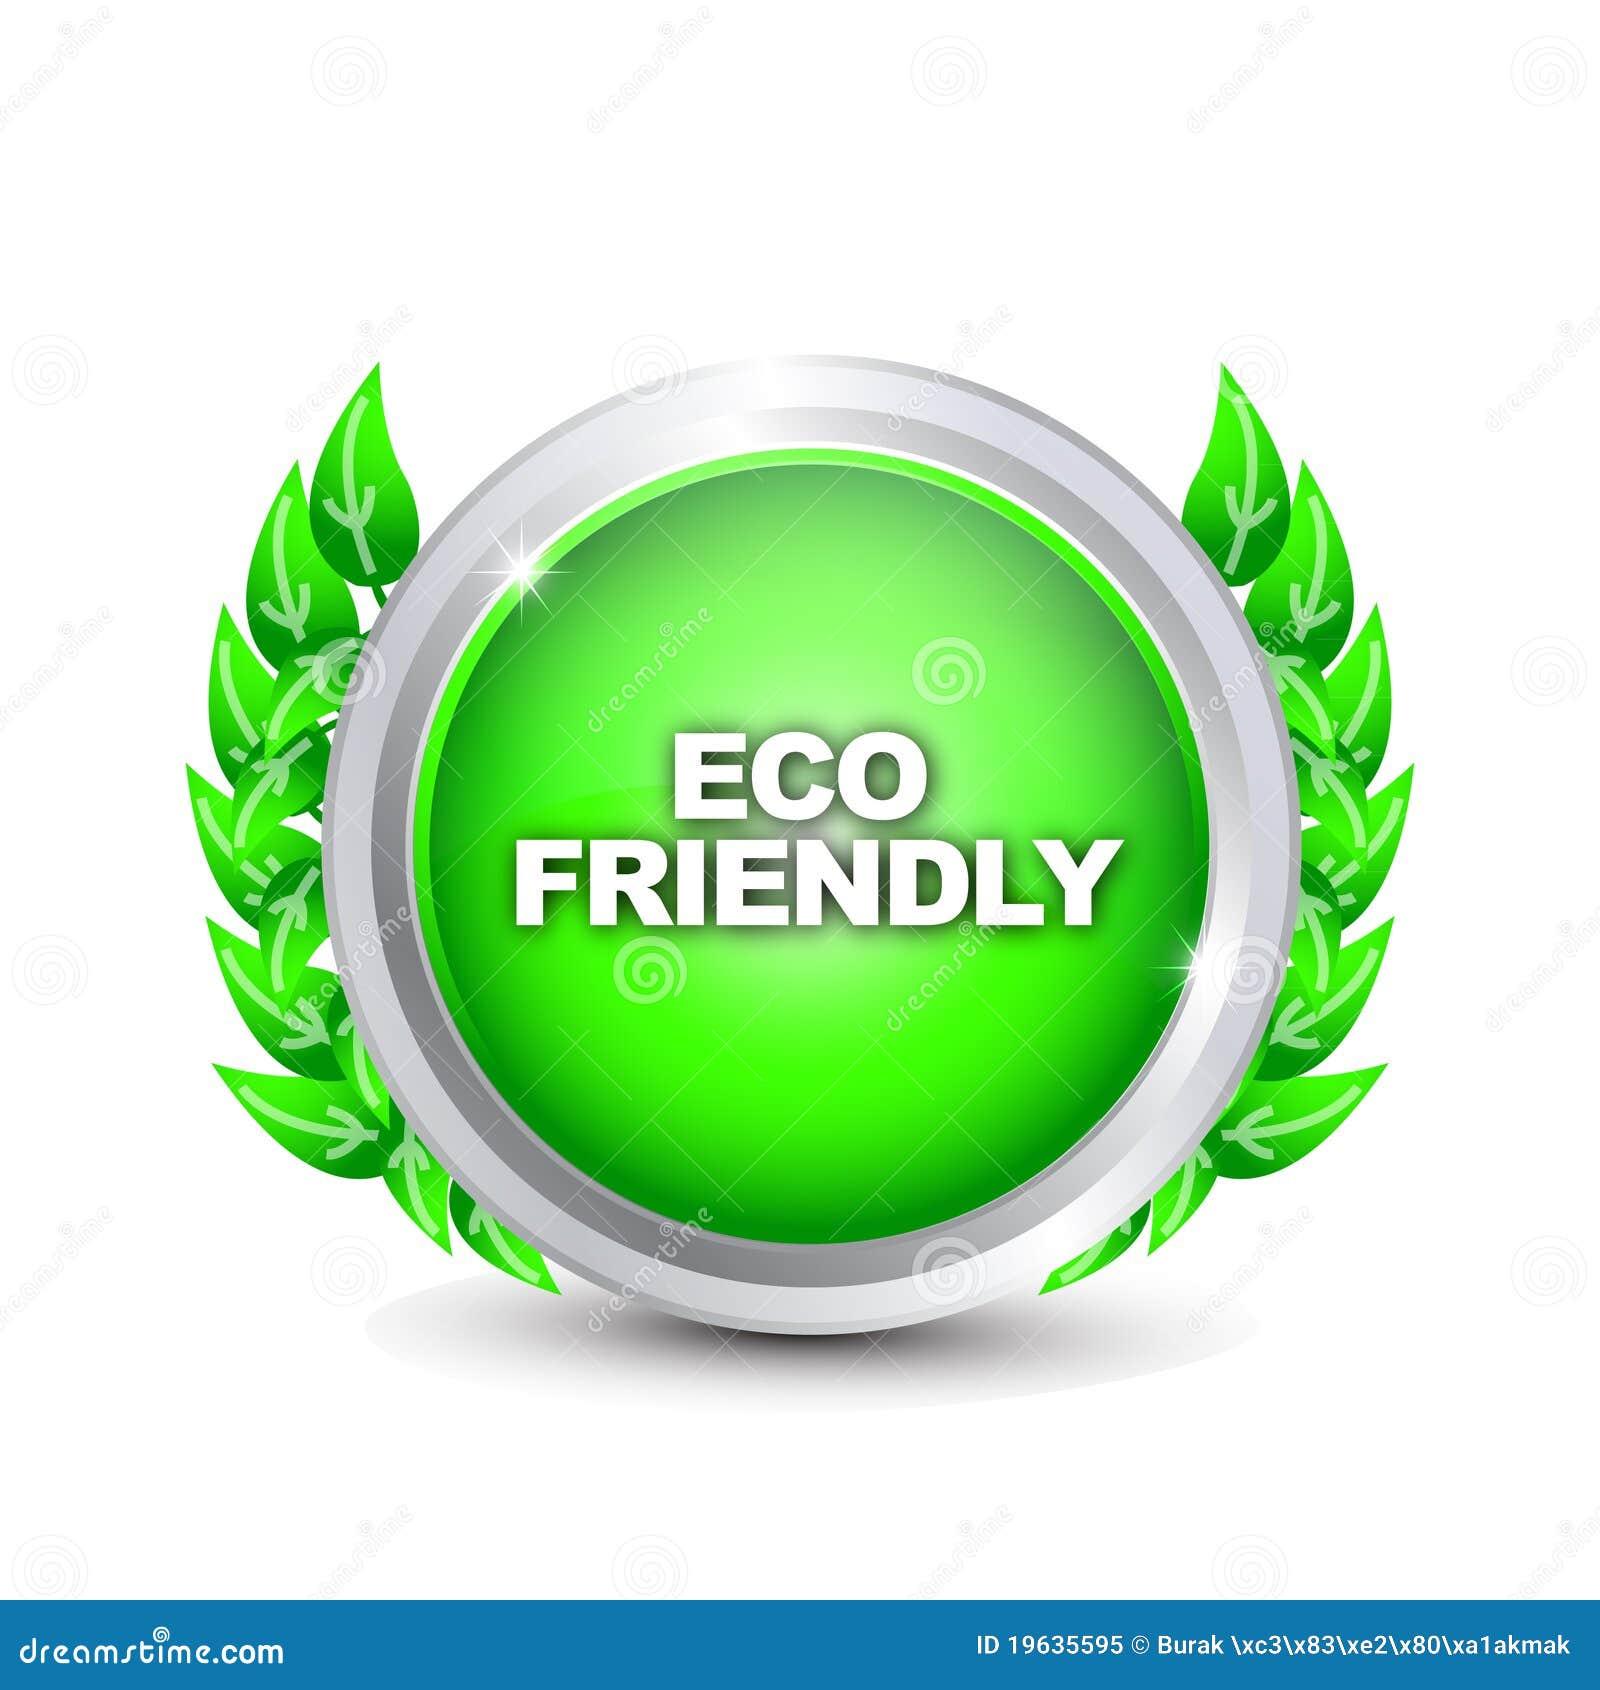 Eco friendly_3